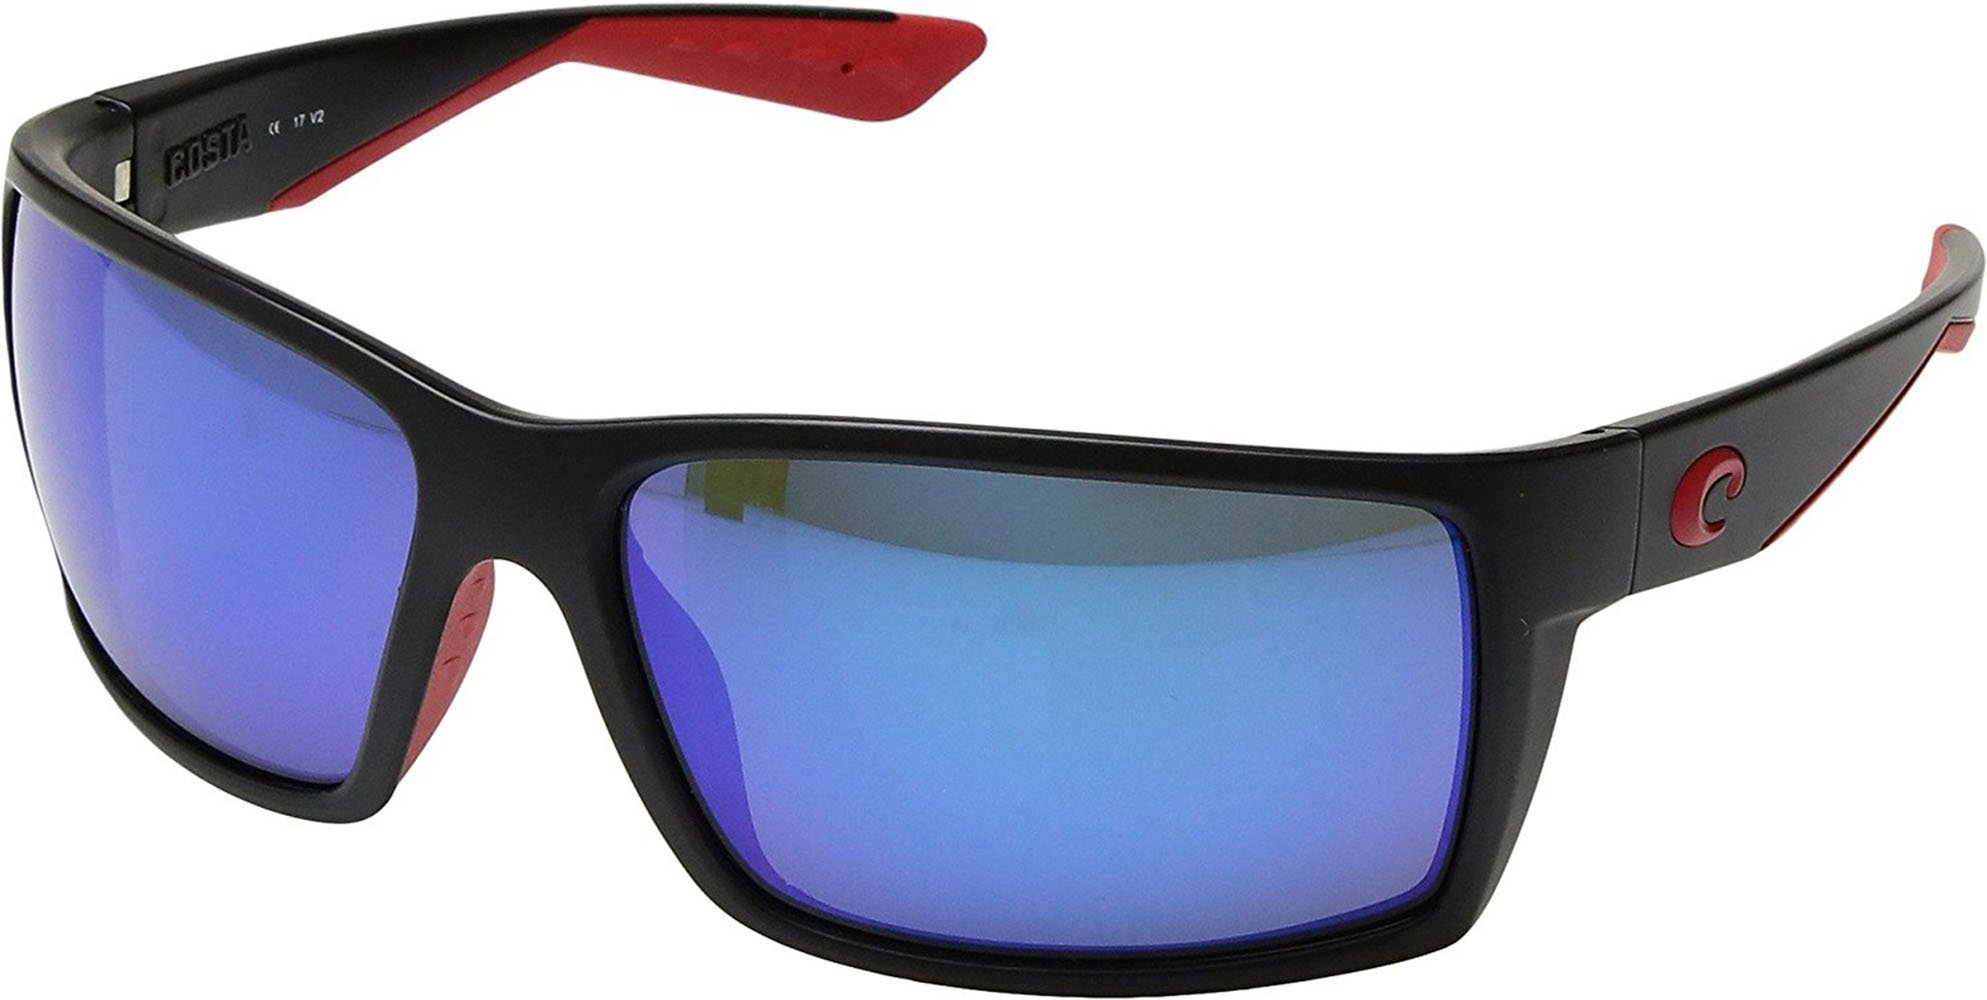 Costa Unisex Reefton Race Black/Blue Mirror 580g One Size